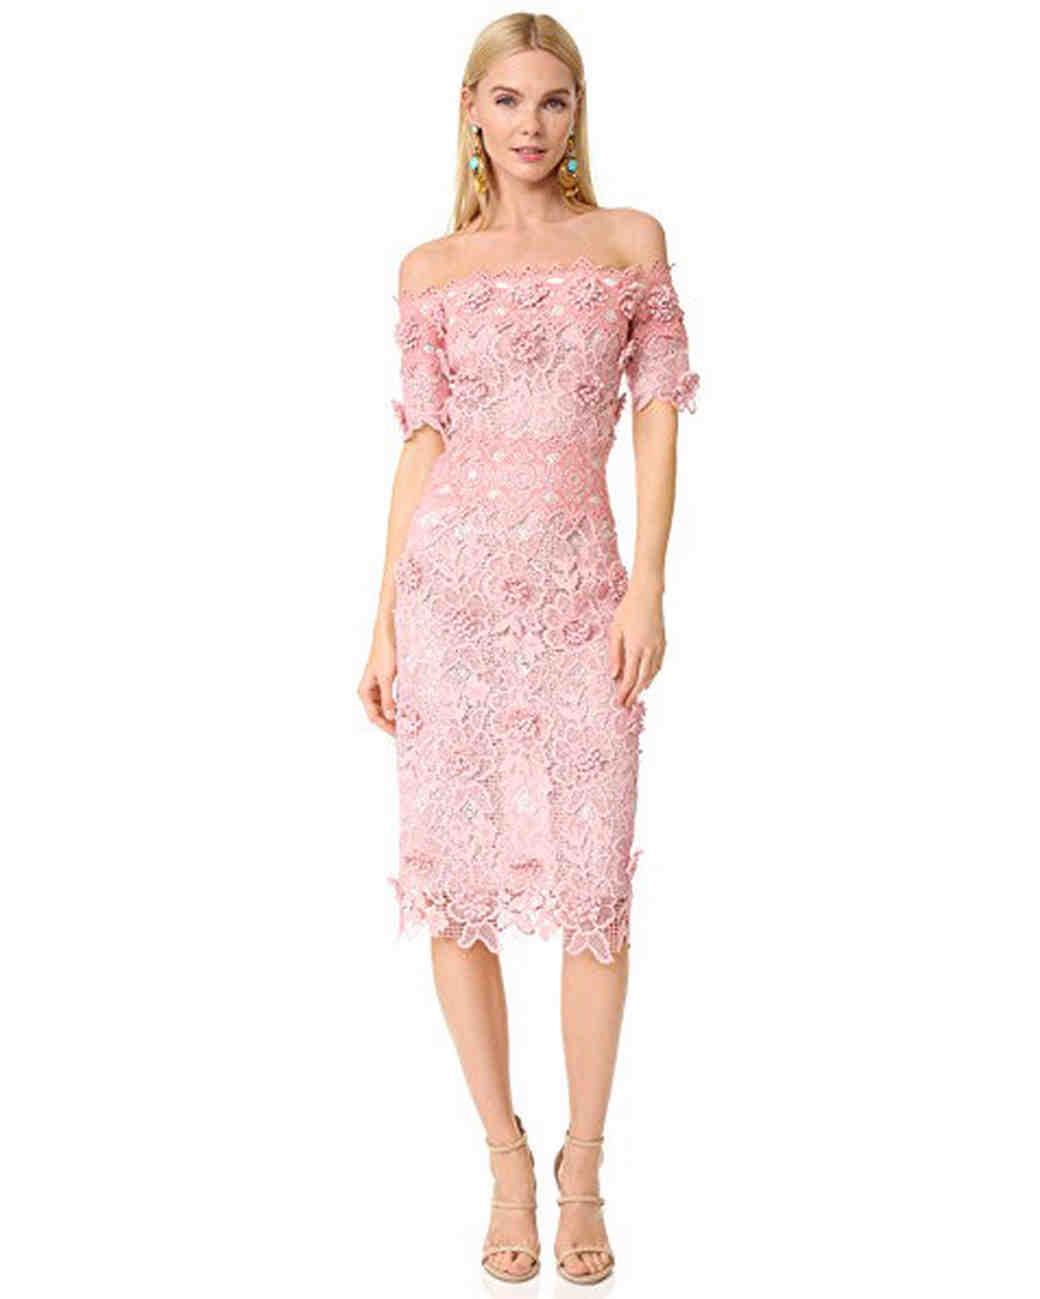 Engagement Party Dresses Worth Splurging On | Martha Stewart Weddings